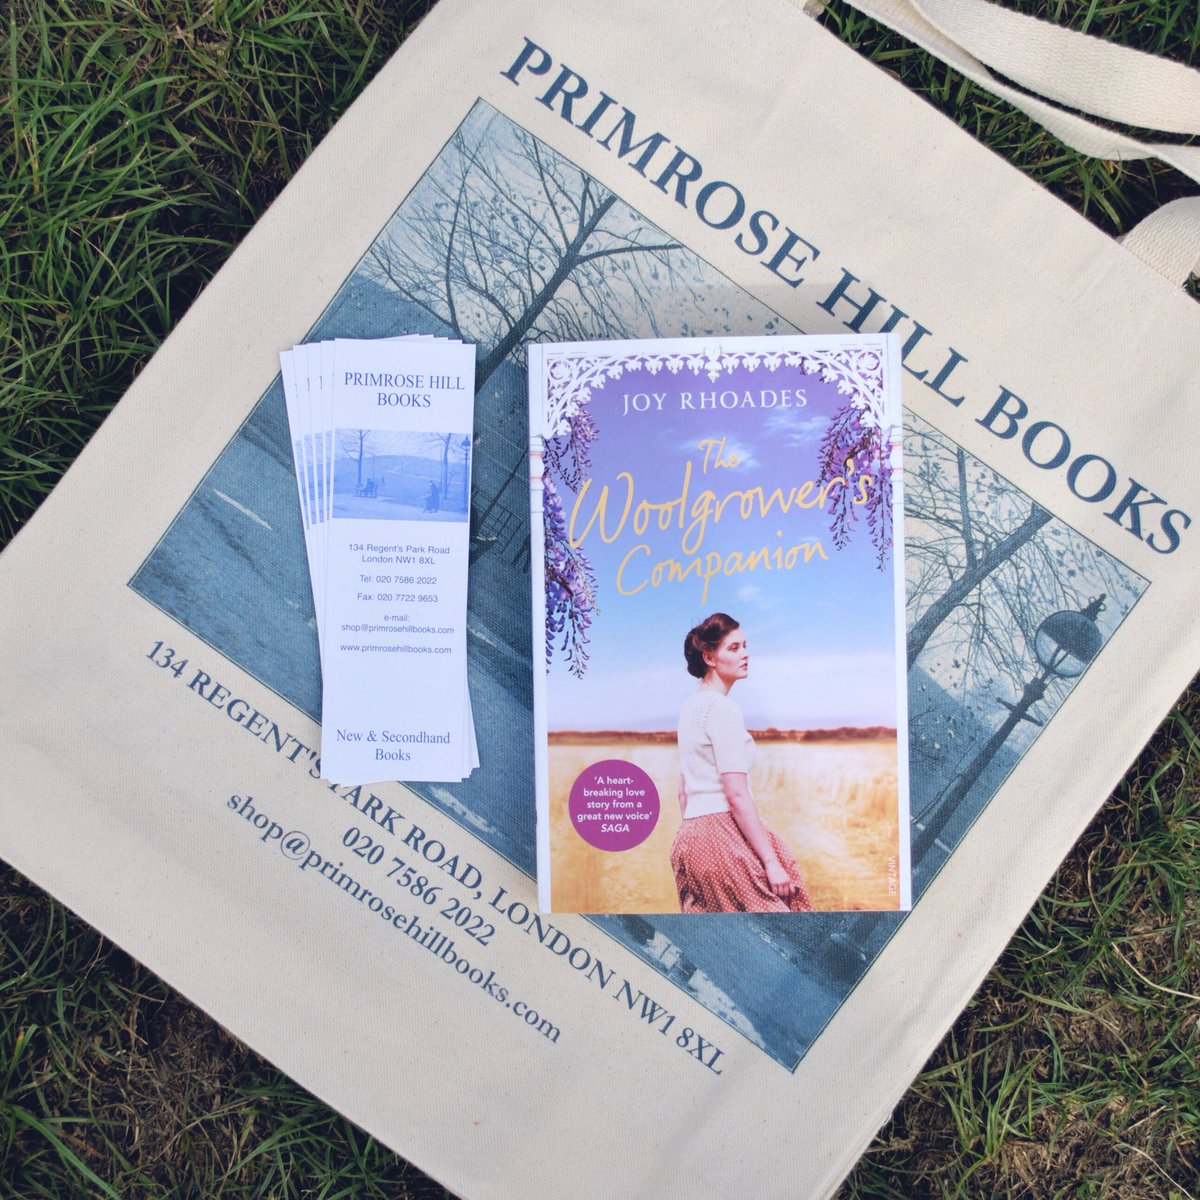 Primrose Hill Books on Twitter: